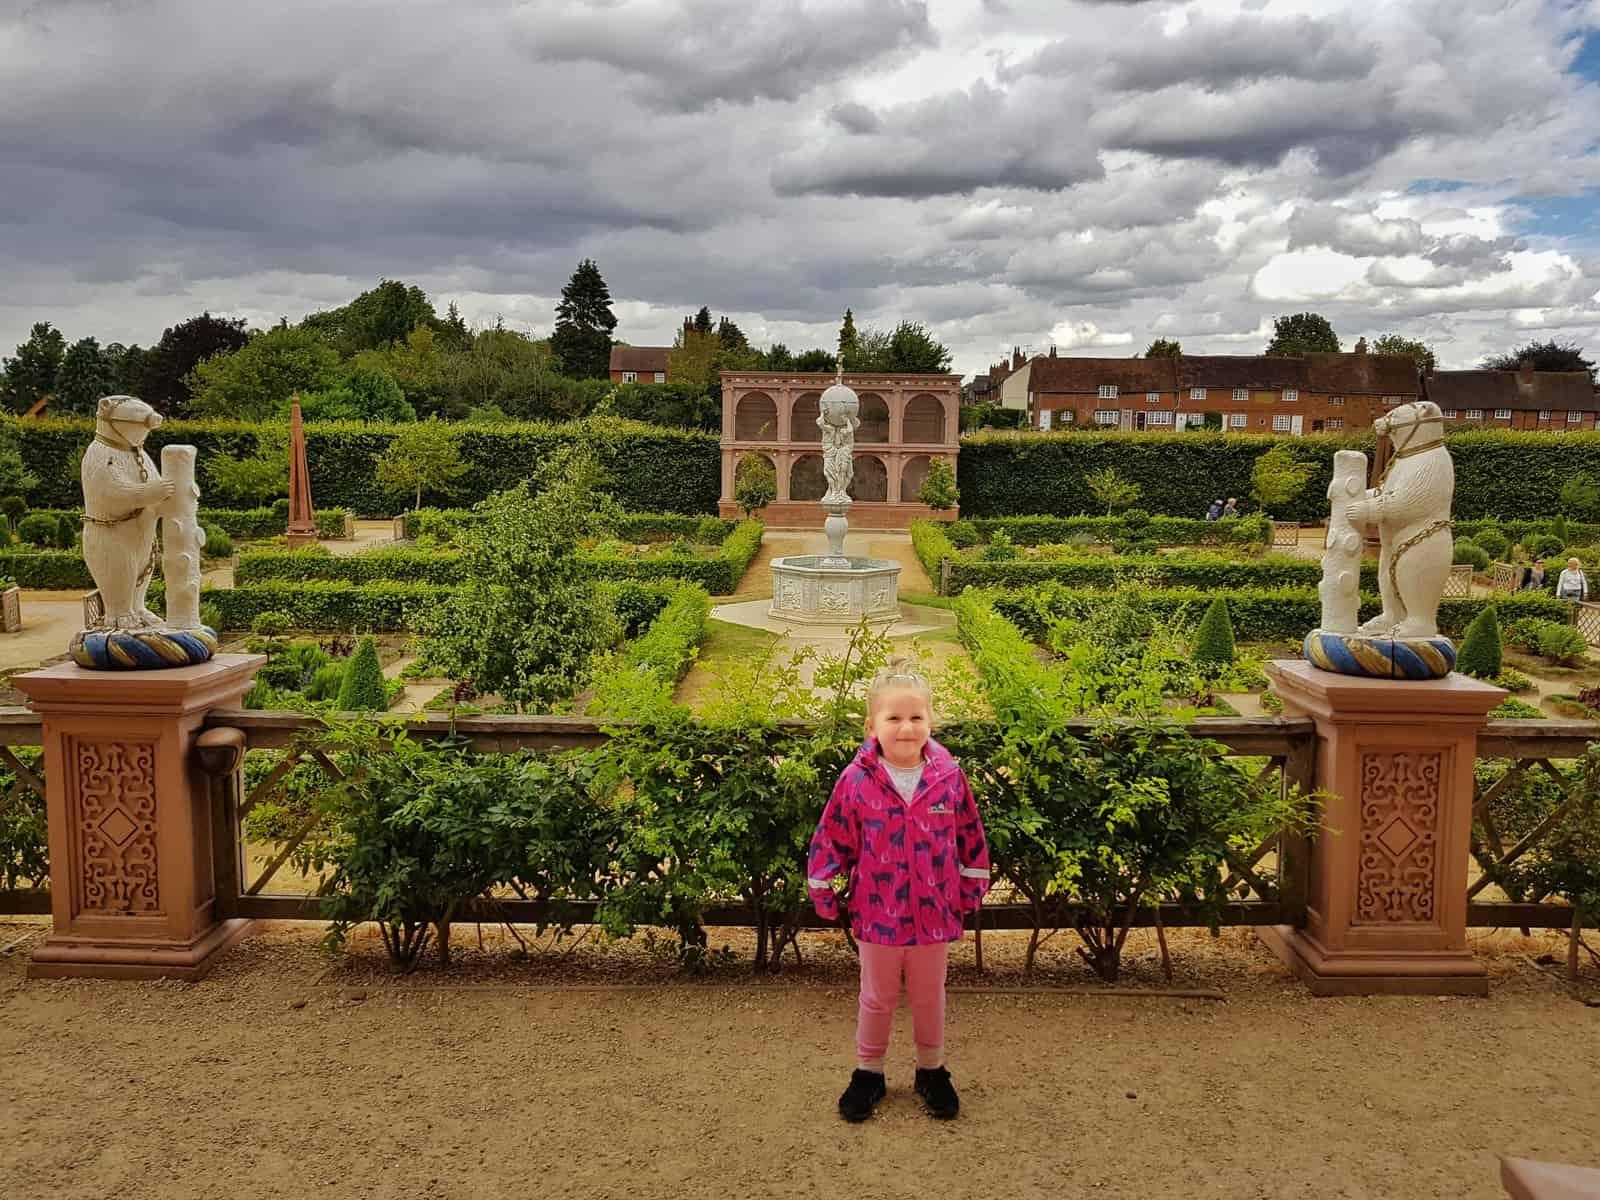 Kenilworth Castle Warwickshire formal gardens